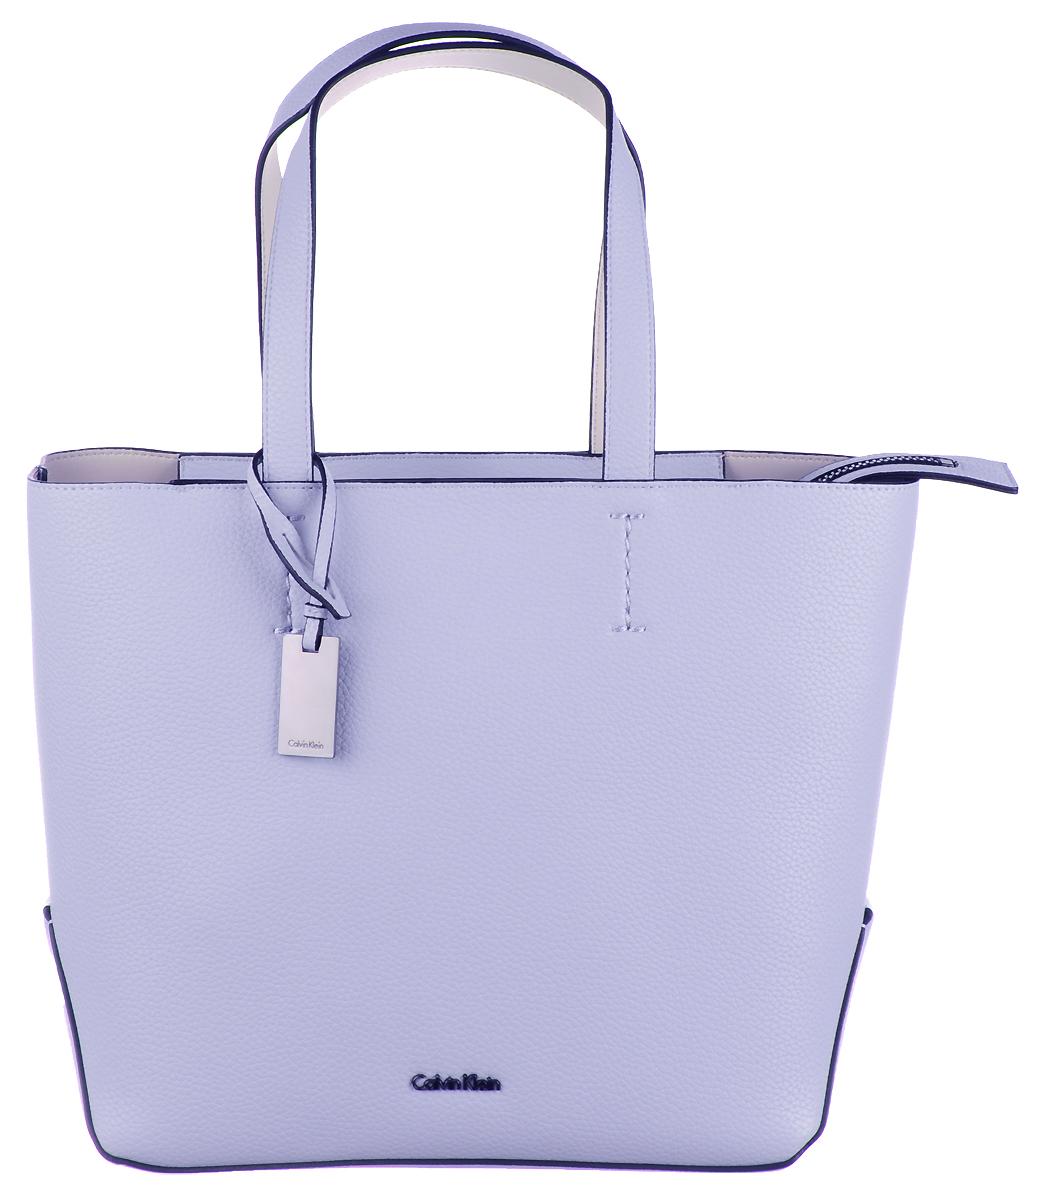 Сумка женская Calvin Klein Jeans, цвет: светло-сиреневый. K60K603833/427 блузка женская calvin klein jeans цвет синий j20j207813 4040 размер s 42 44